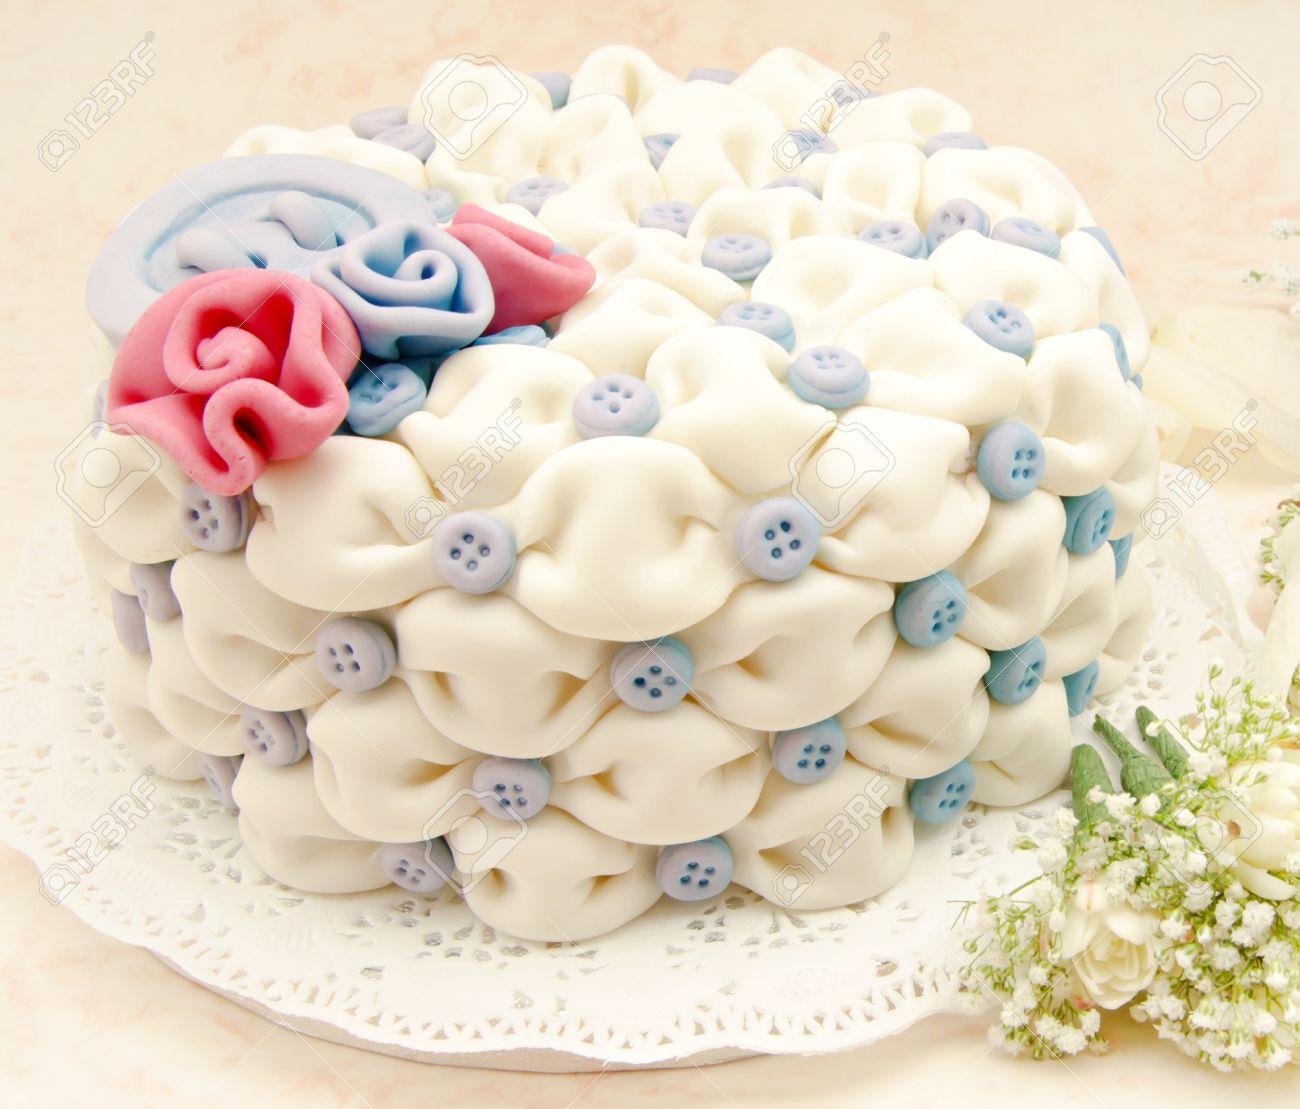 White Wedding Cake With Blue Flowers On White Background Stock Photo ...